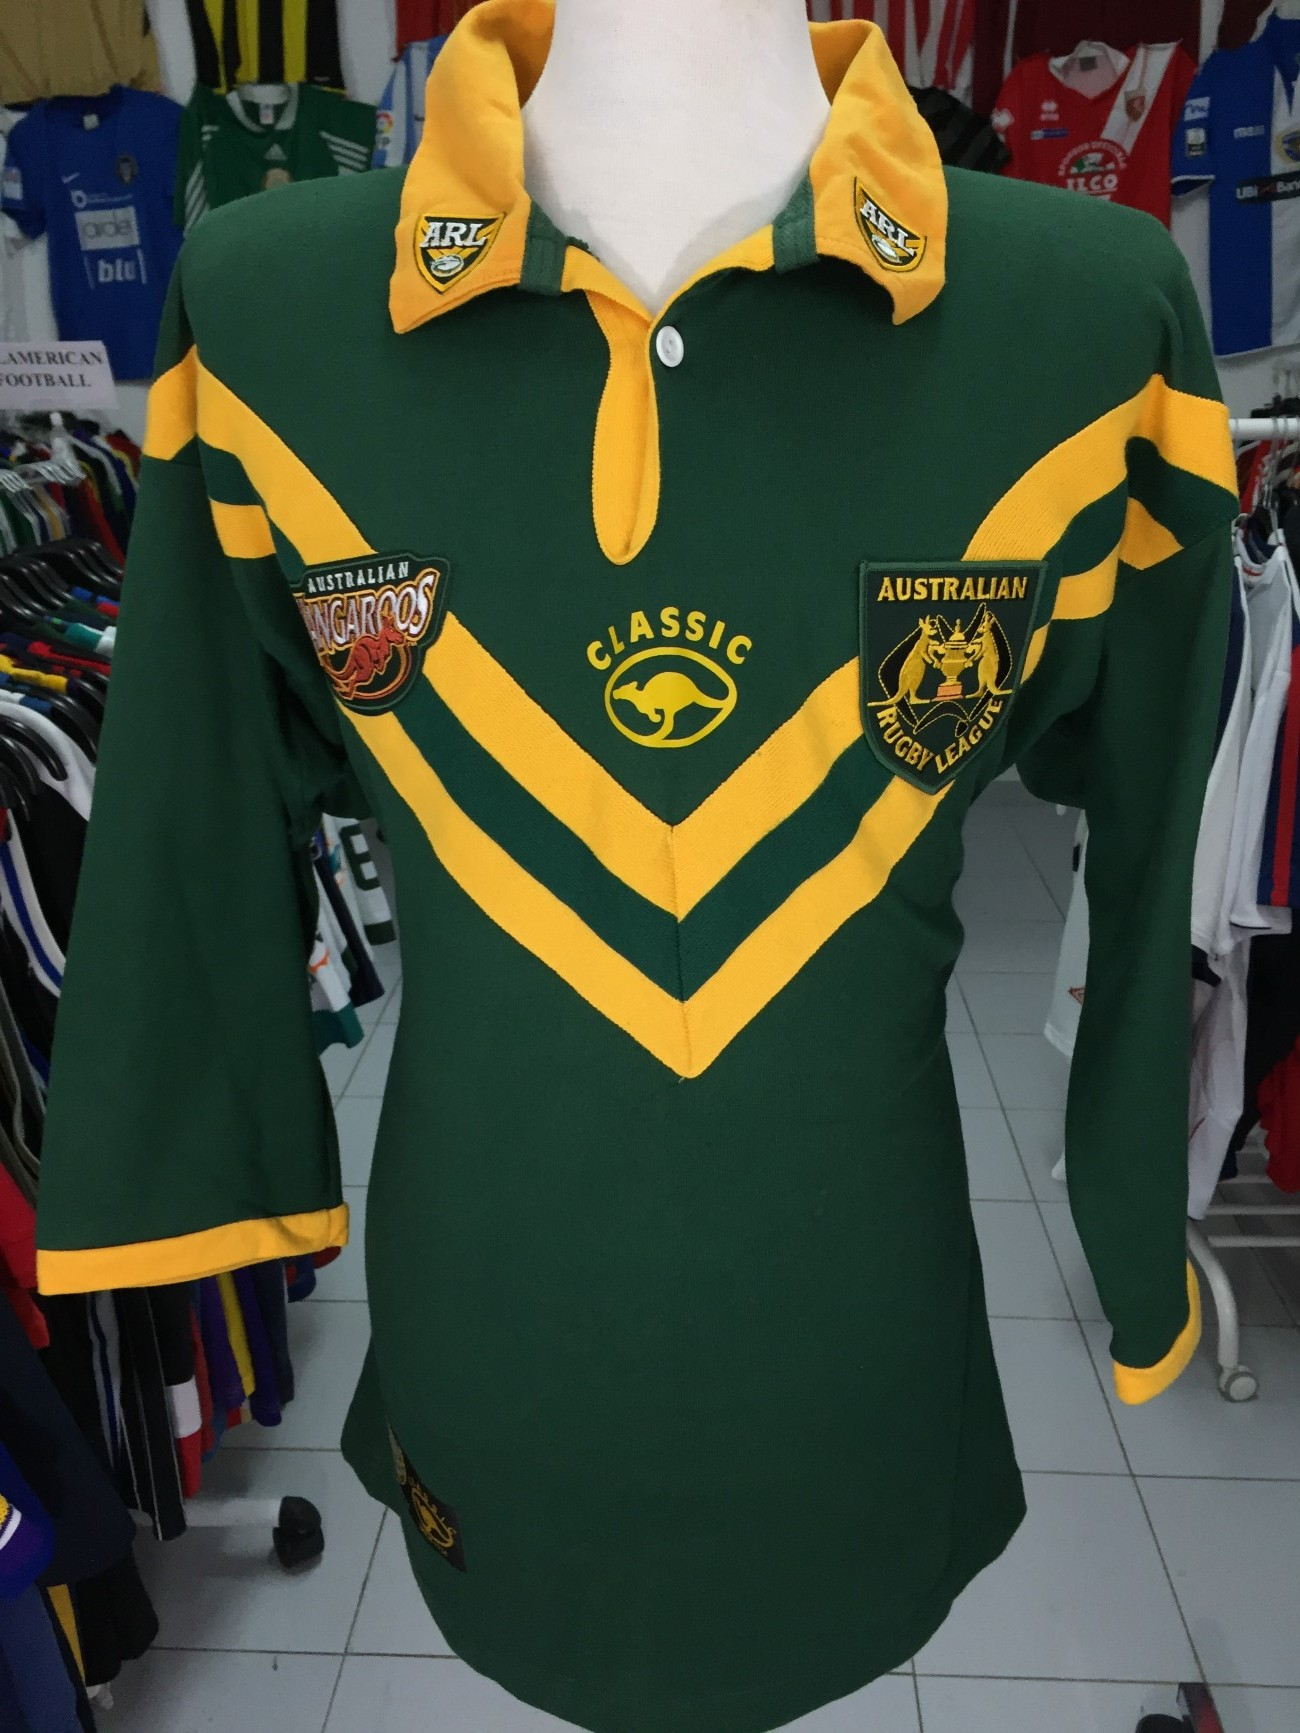 NEW ZEALAND Patriotic Retro Strip T-Shirt *Choice Of MENS LADIES KIDS BABY GROW*